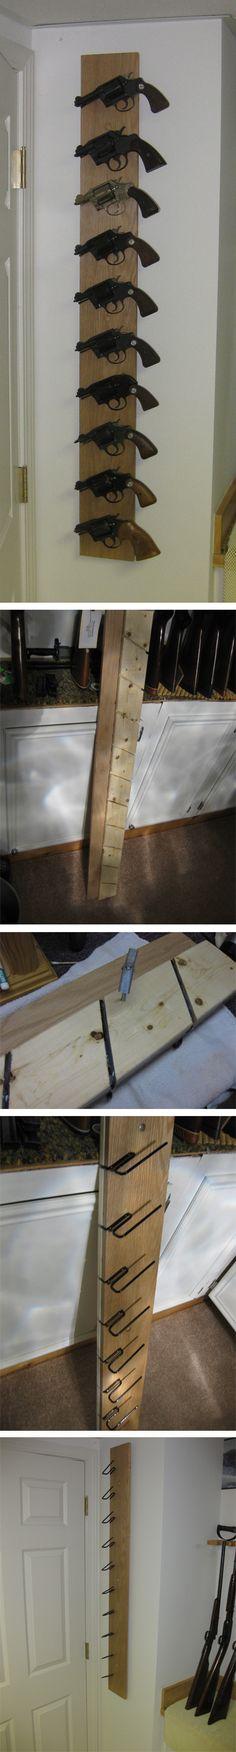 Using Gun Storage Solutions Back-Under Handgun Hangers, this customer created a vertical gun rack to store his pistols.